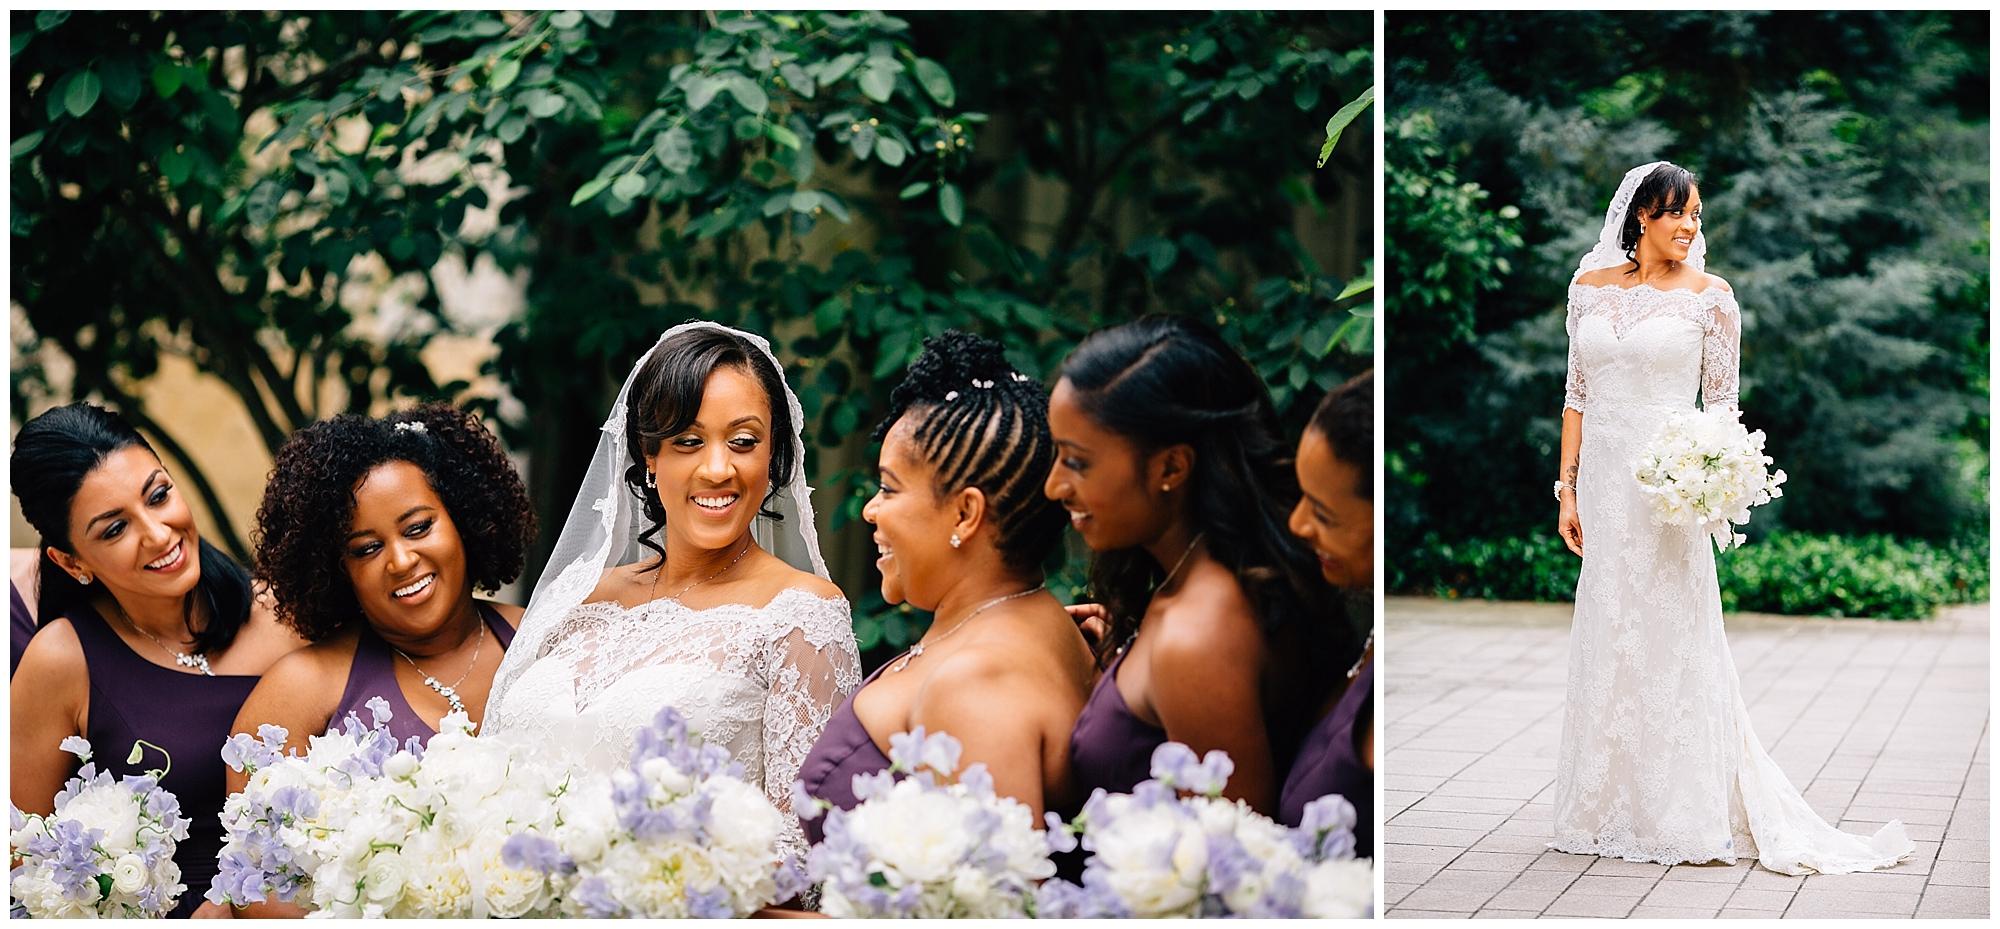 Umstead-wedding-photographer_0027.jpg